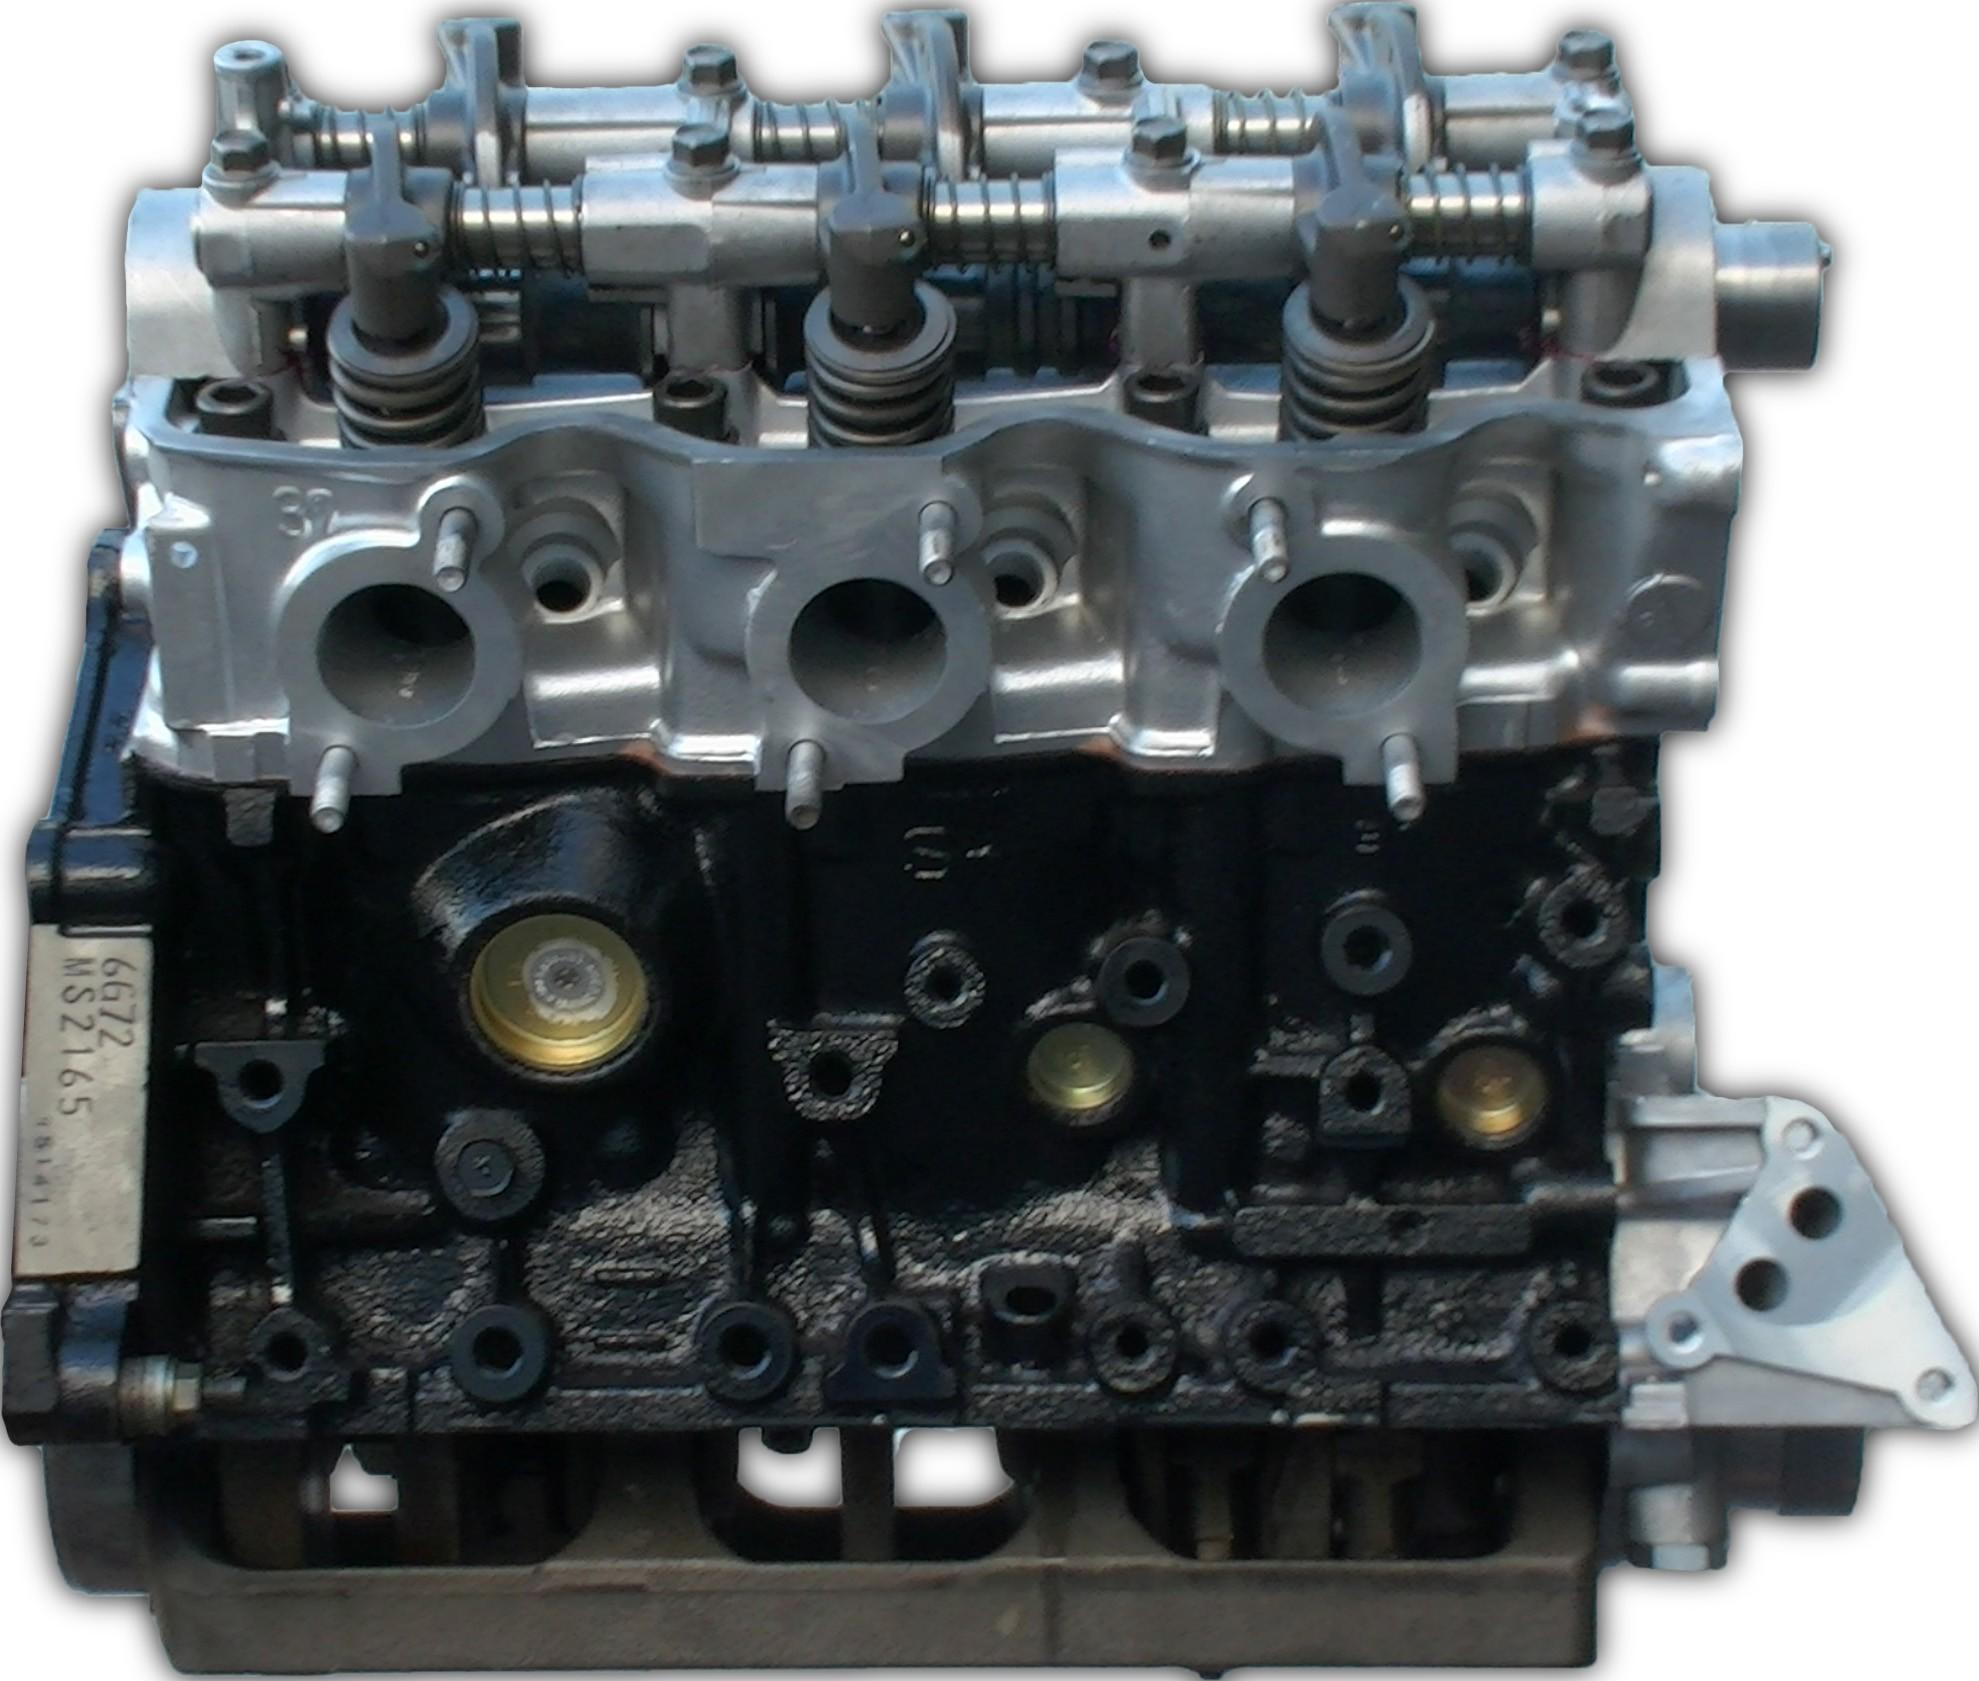 3 0 L Engine: Rebuilt 89 Dodge Raider 3.0L V6 Engine « Kar King Auto